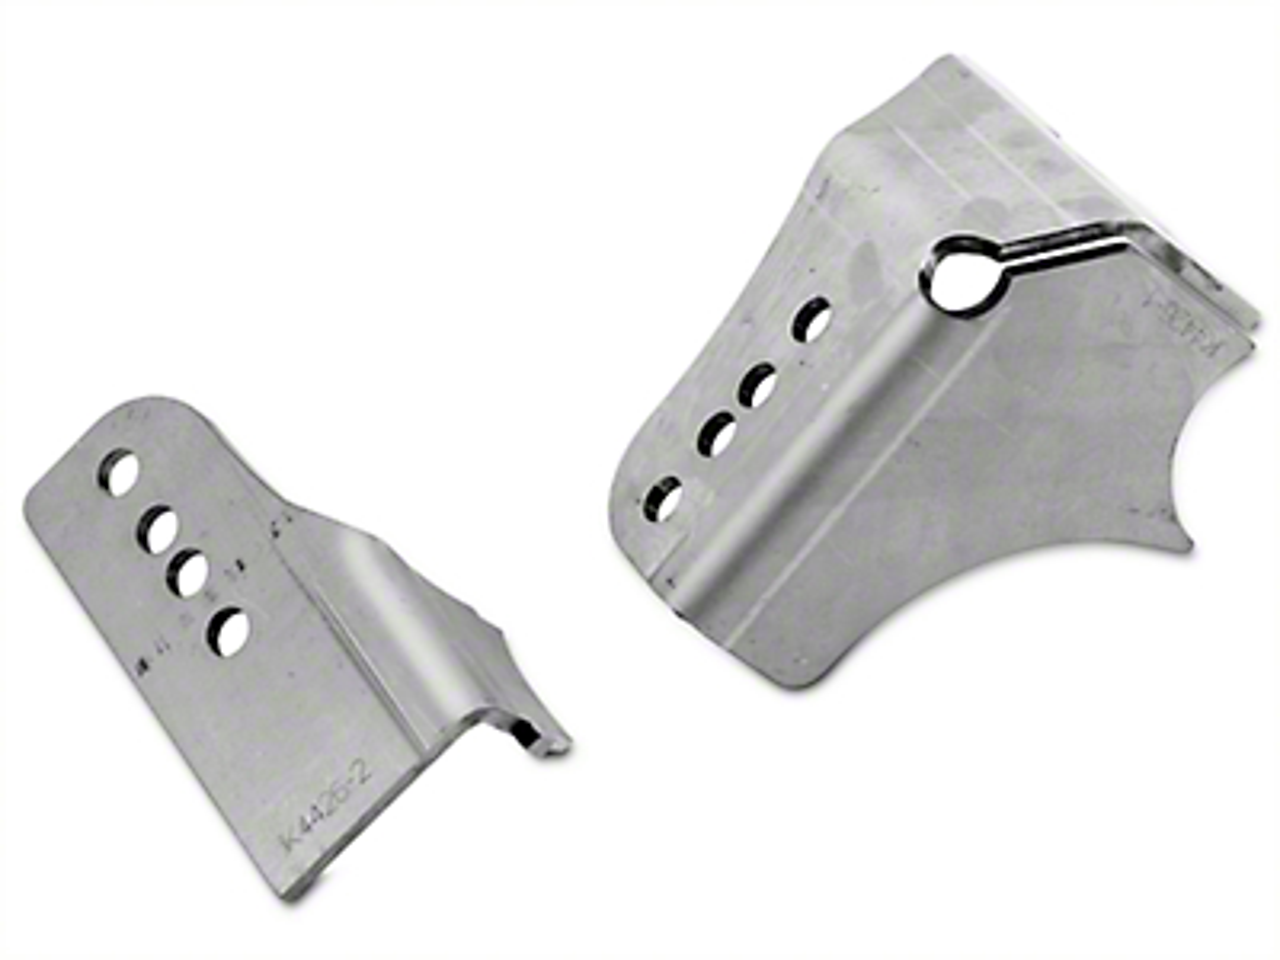 Artec Industries Rear Tracbar Bracket (07-18 Wrangler JK)